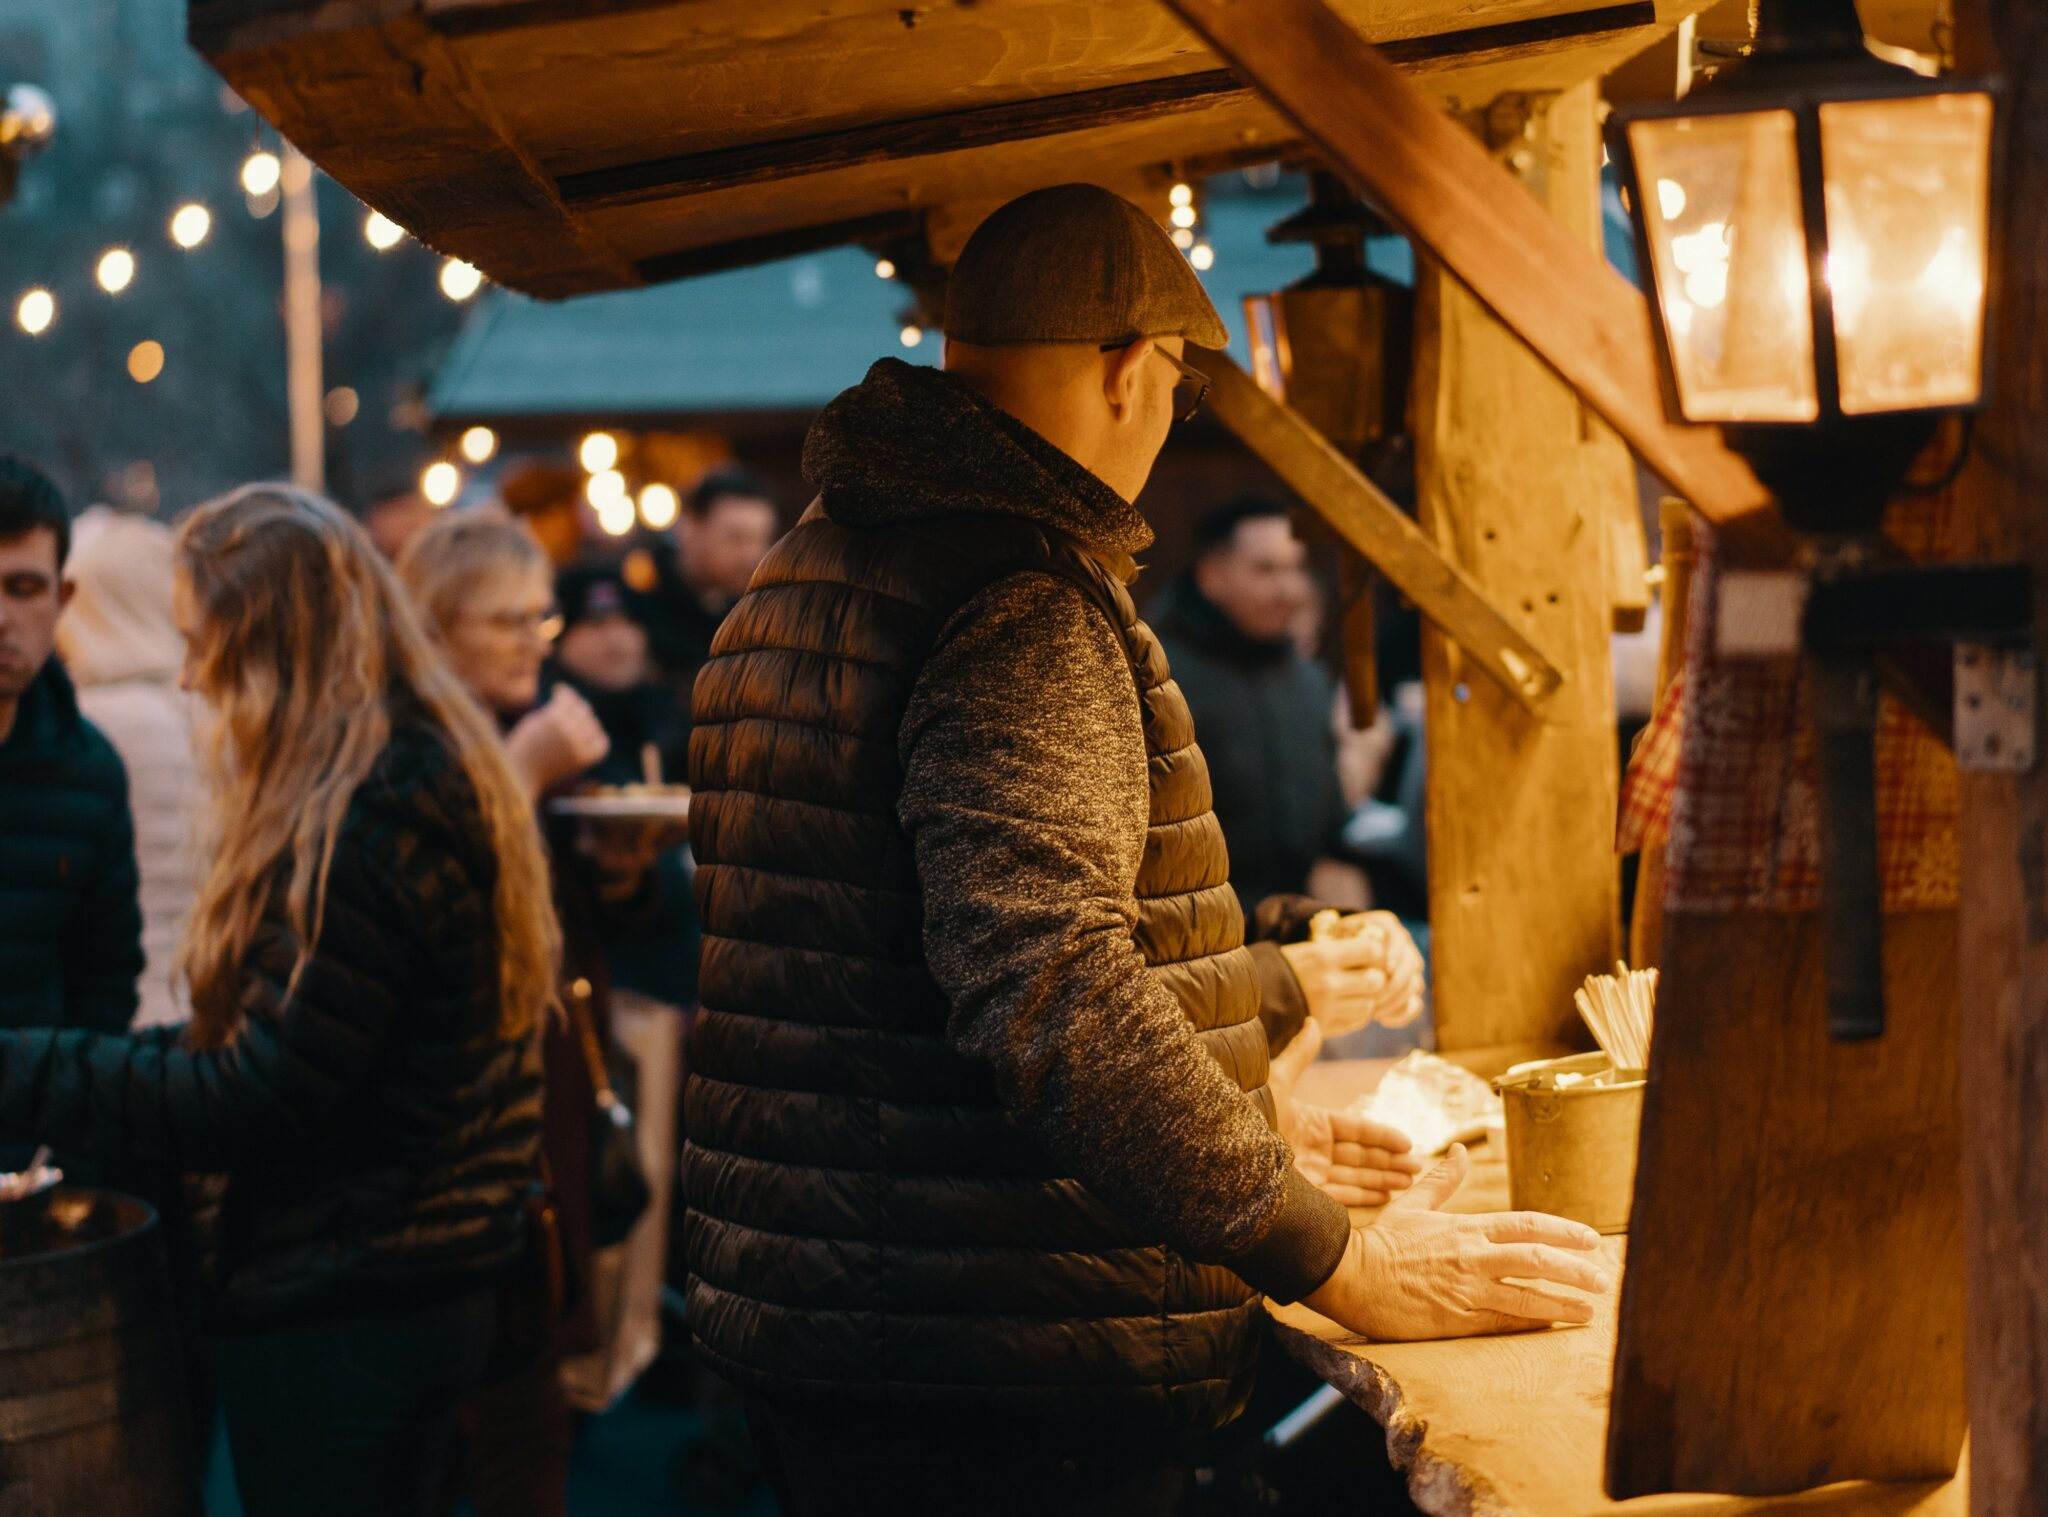 Kerstmarkt Helmond